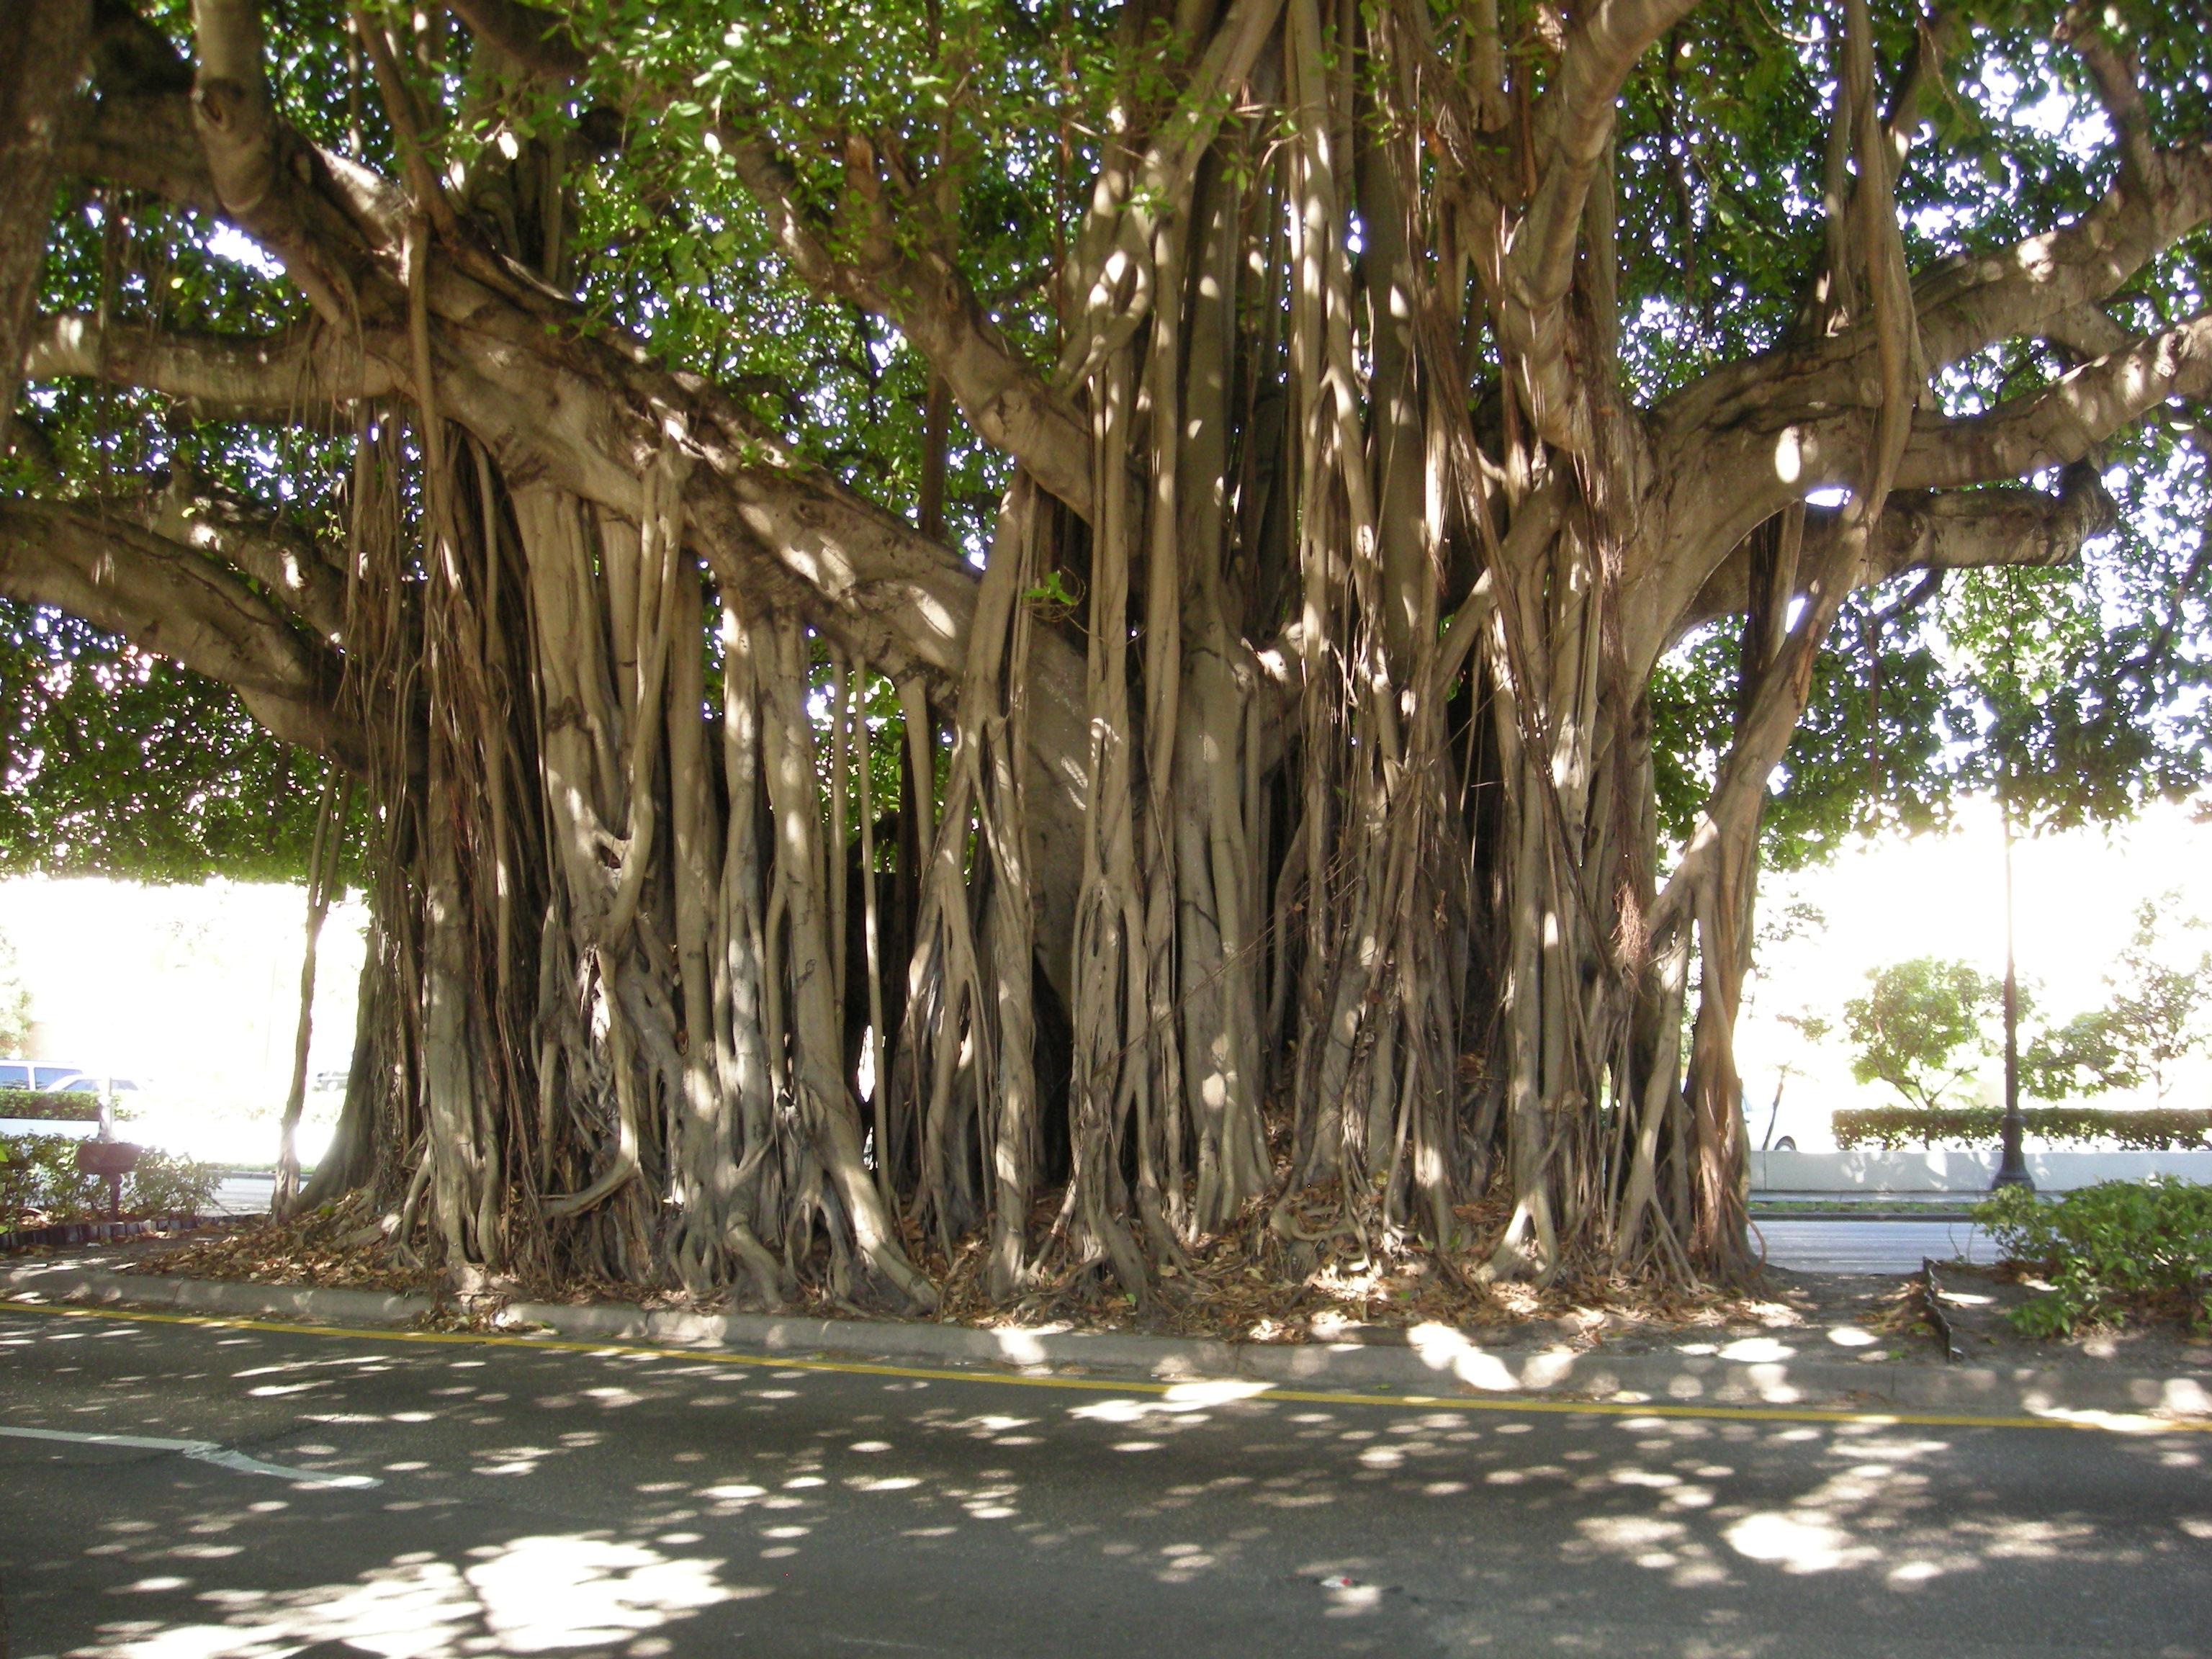 https://upload.wikimedia.org/wikipedia/commons/e/e0/Ficus-Benghalensis-Coral-Gables.JPG